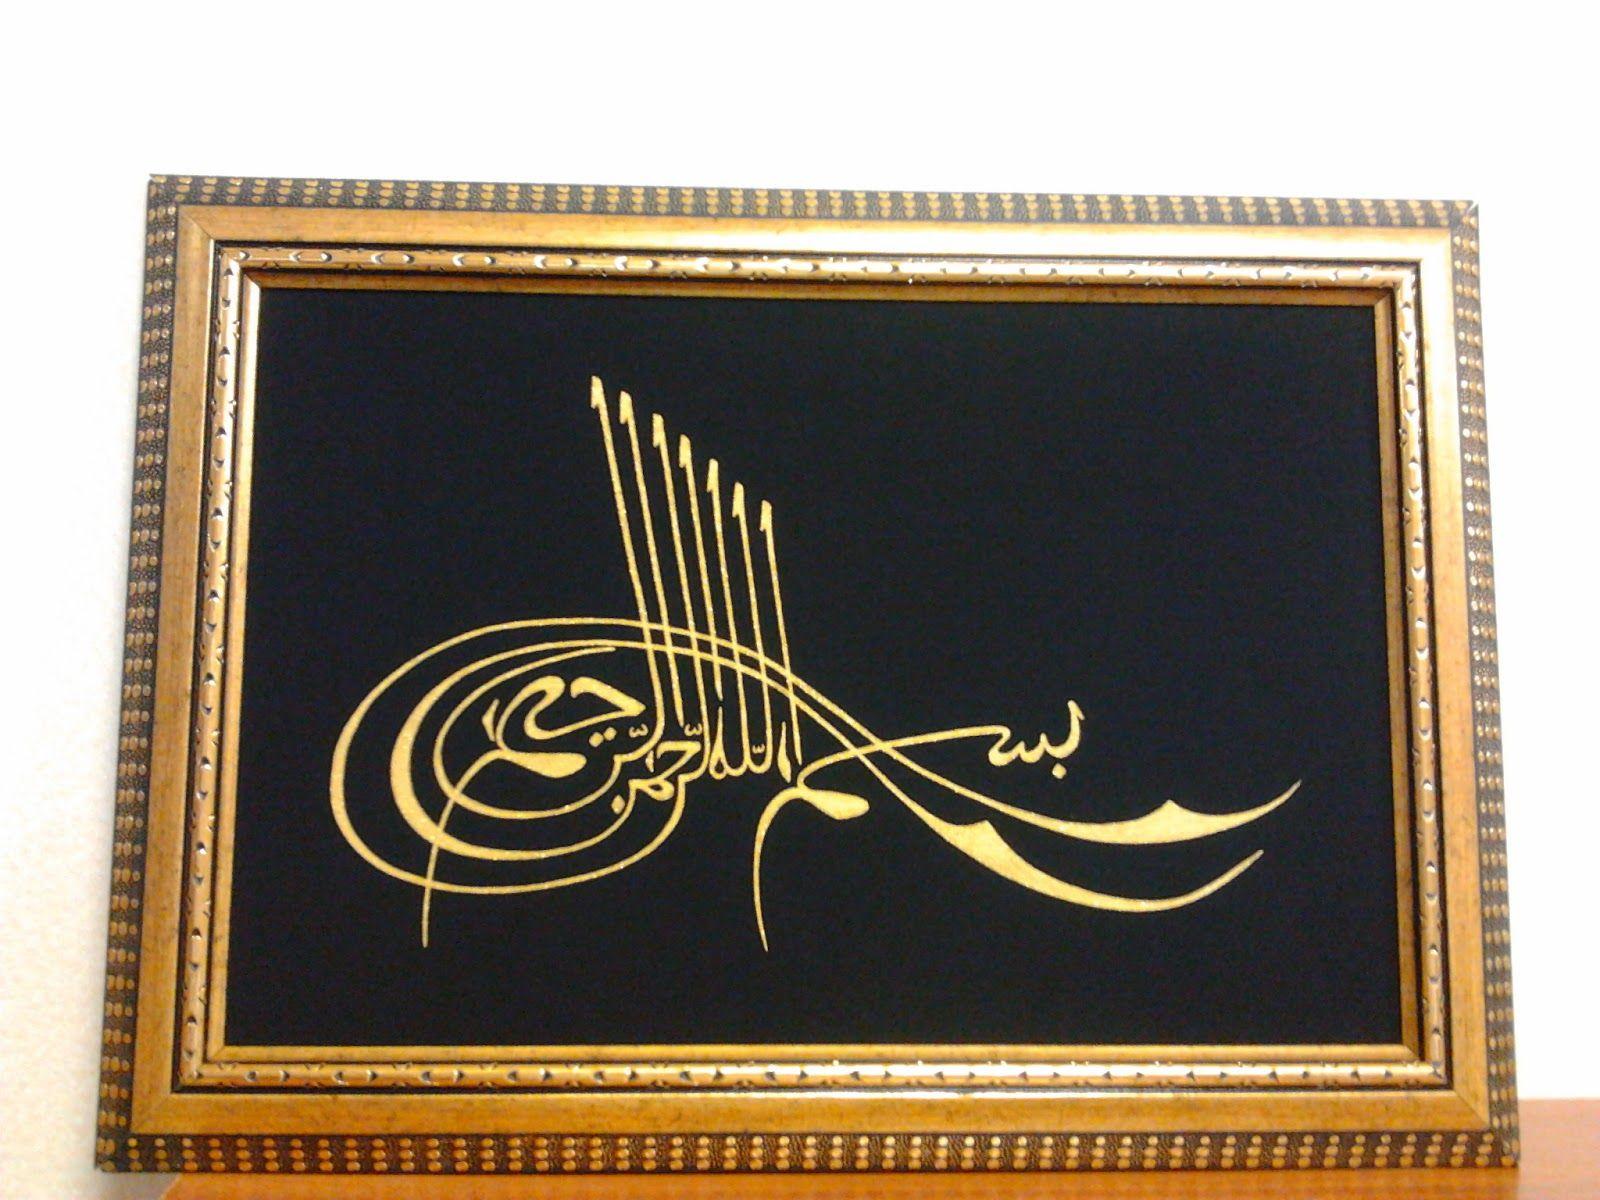 El Sanatlari Goruntuler Ile Arapca Kaligrafi Sanati Sanat Tablolar